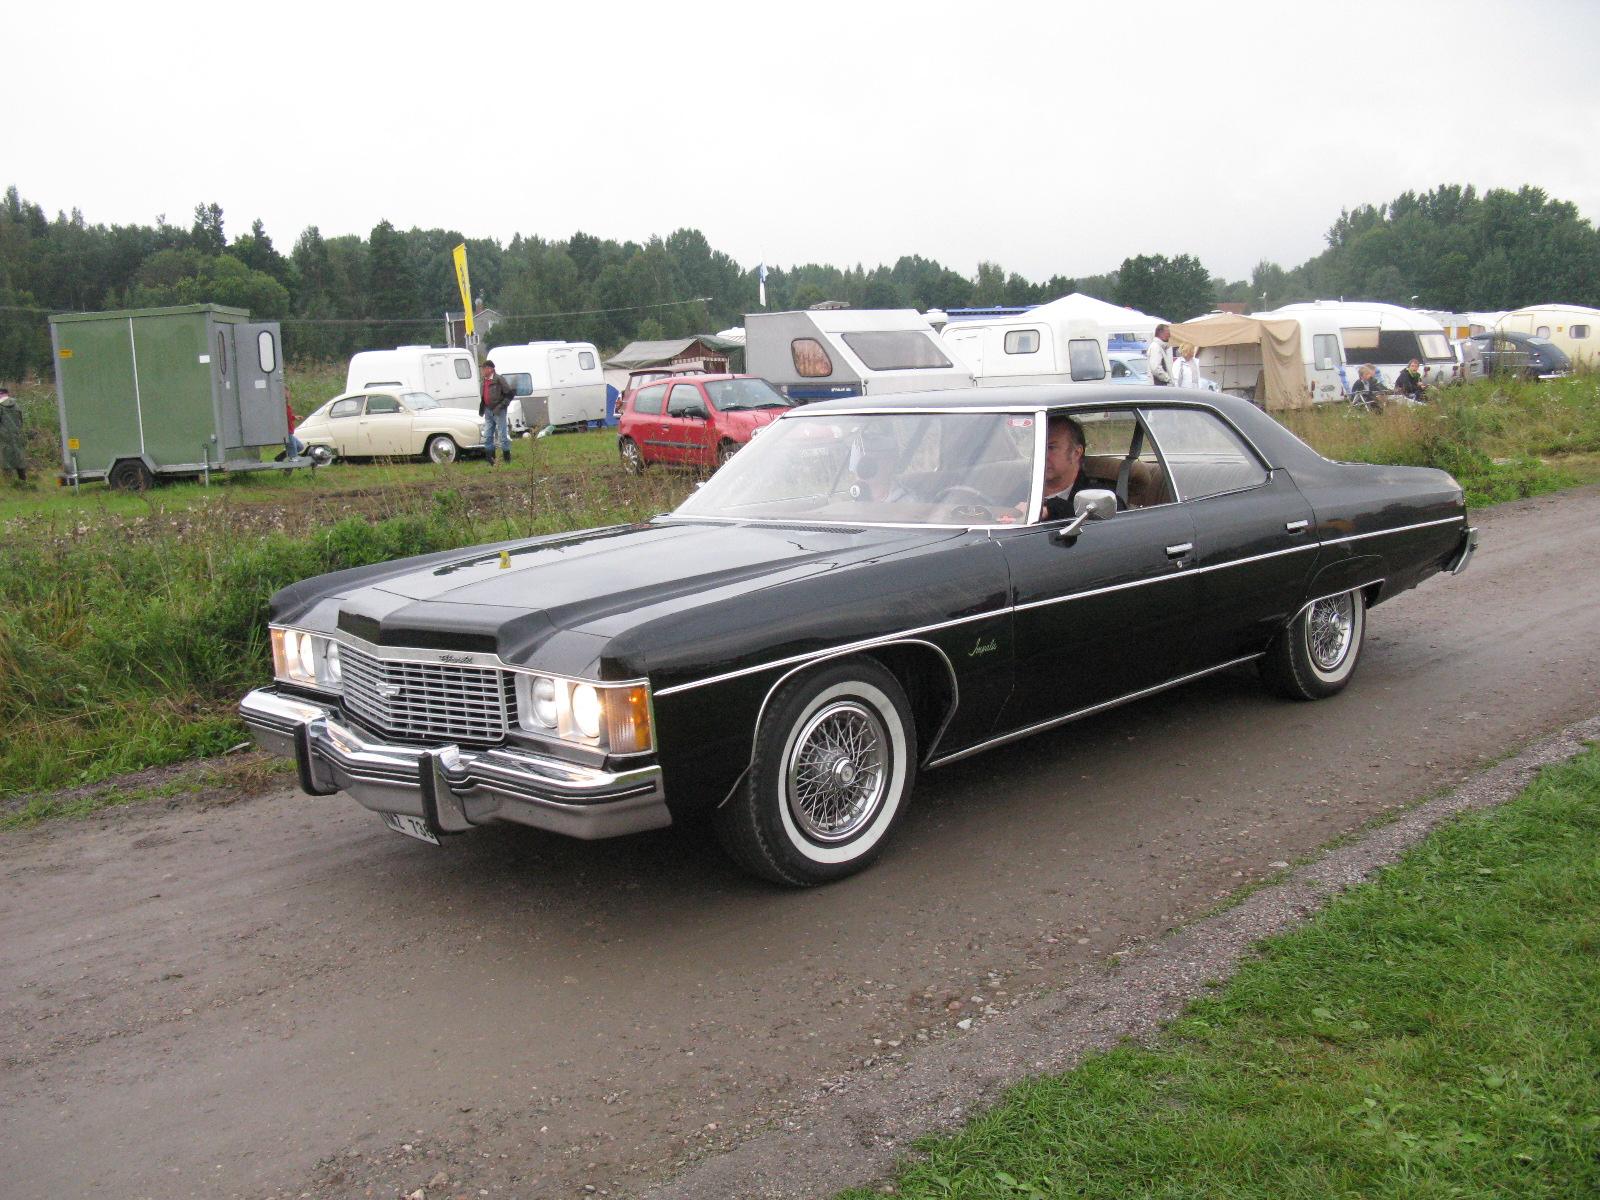 hight resolution of file chevrolet impala 1974 7906271214 jpg